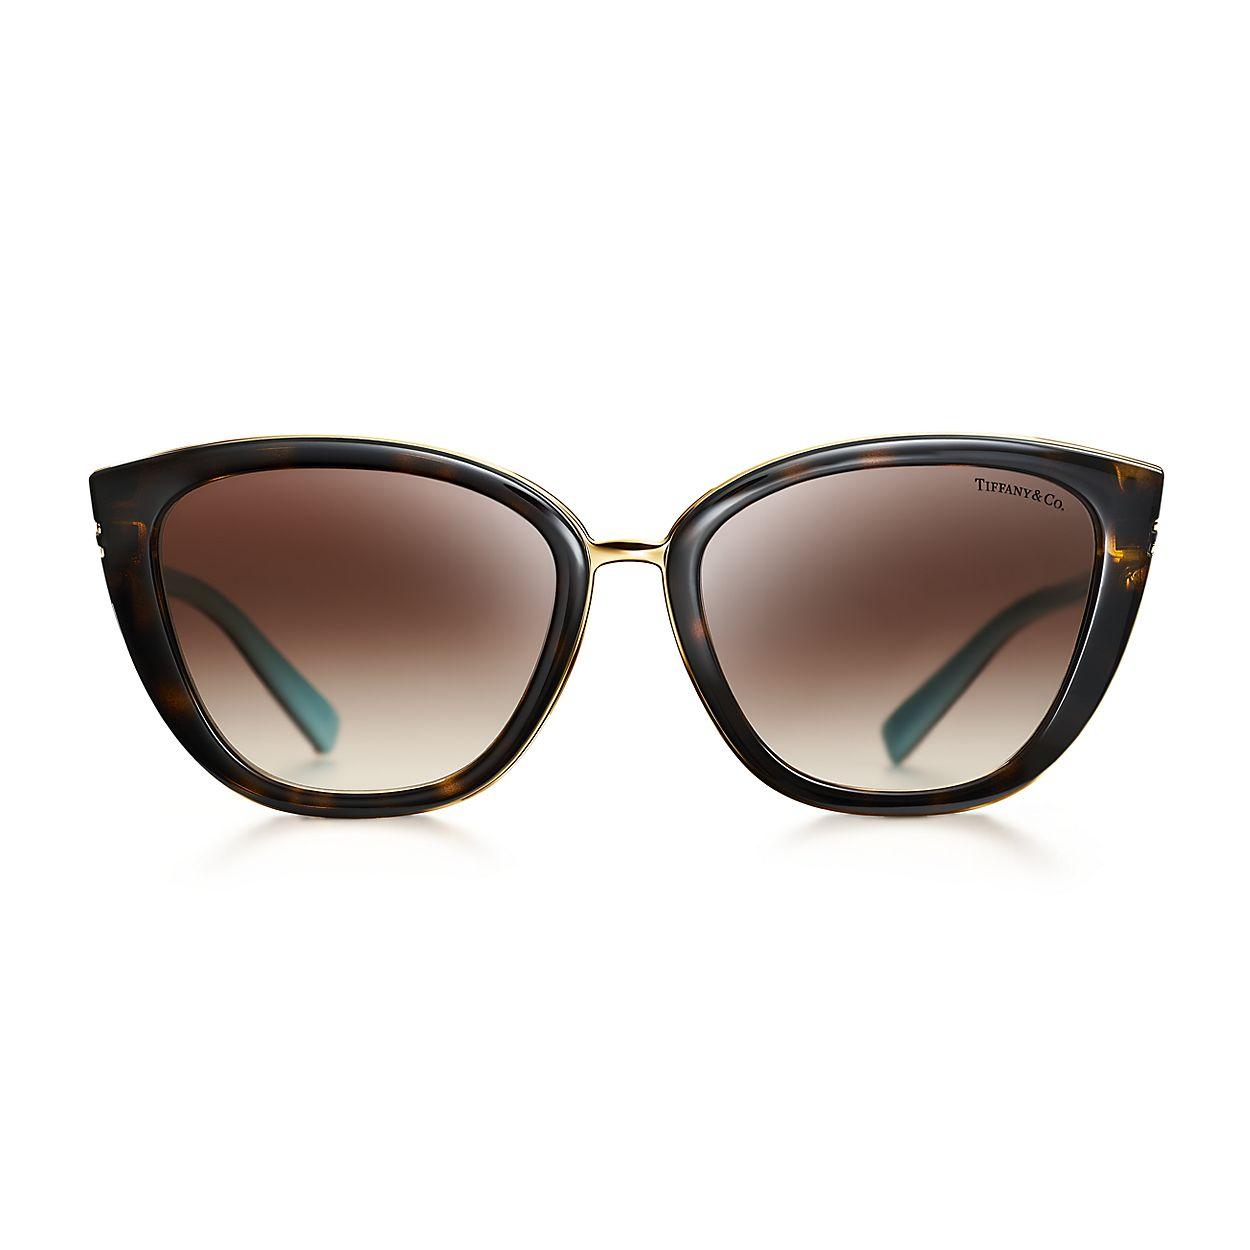 3226fc99ce76 Tiffany T square sunglasses in tortoise acetate.